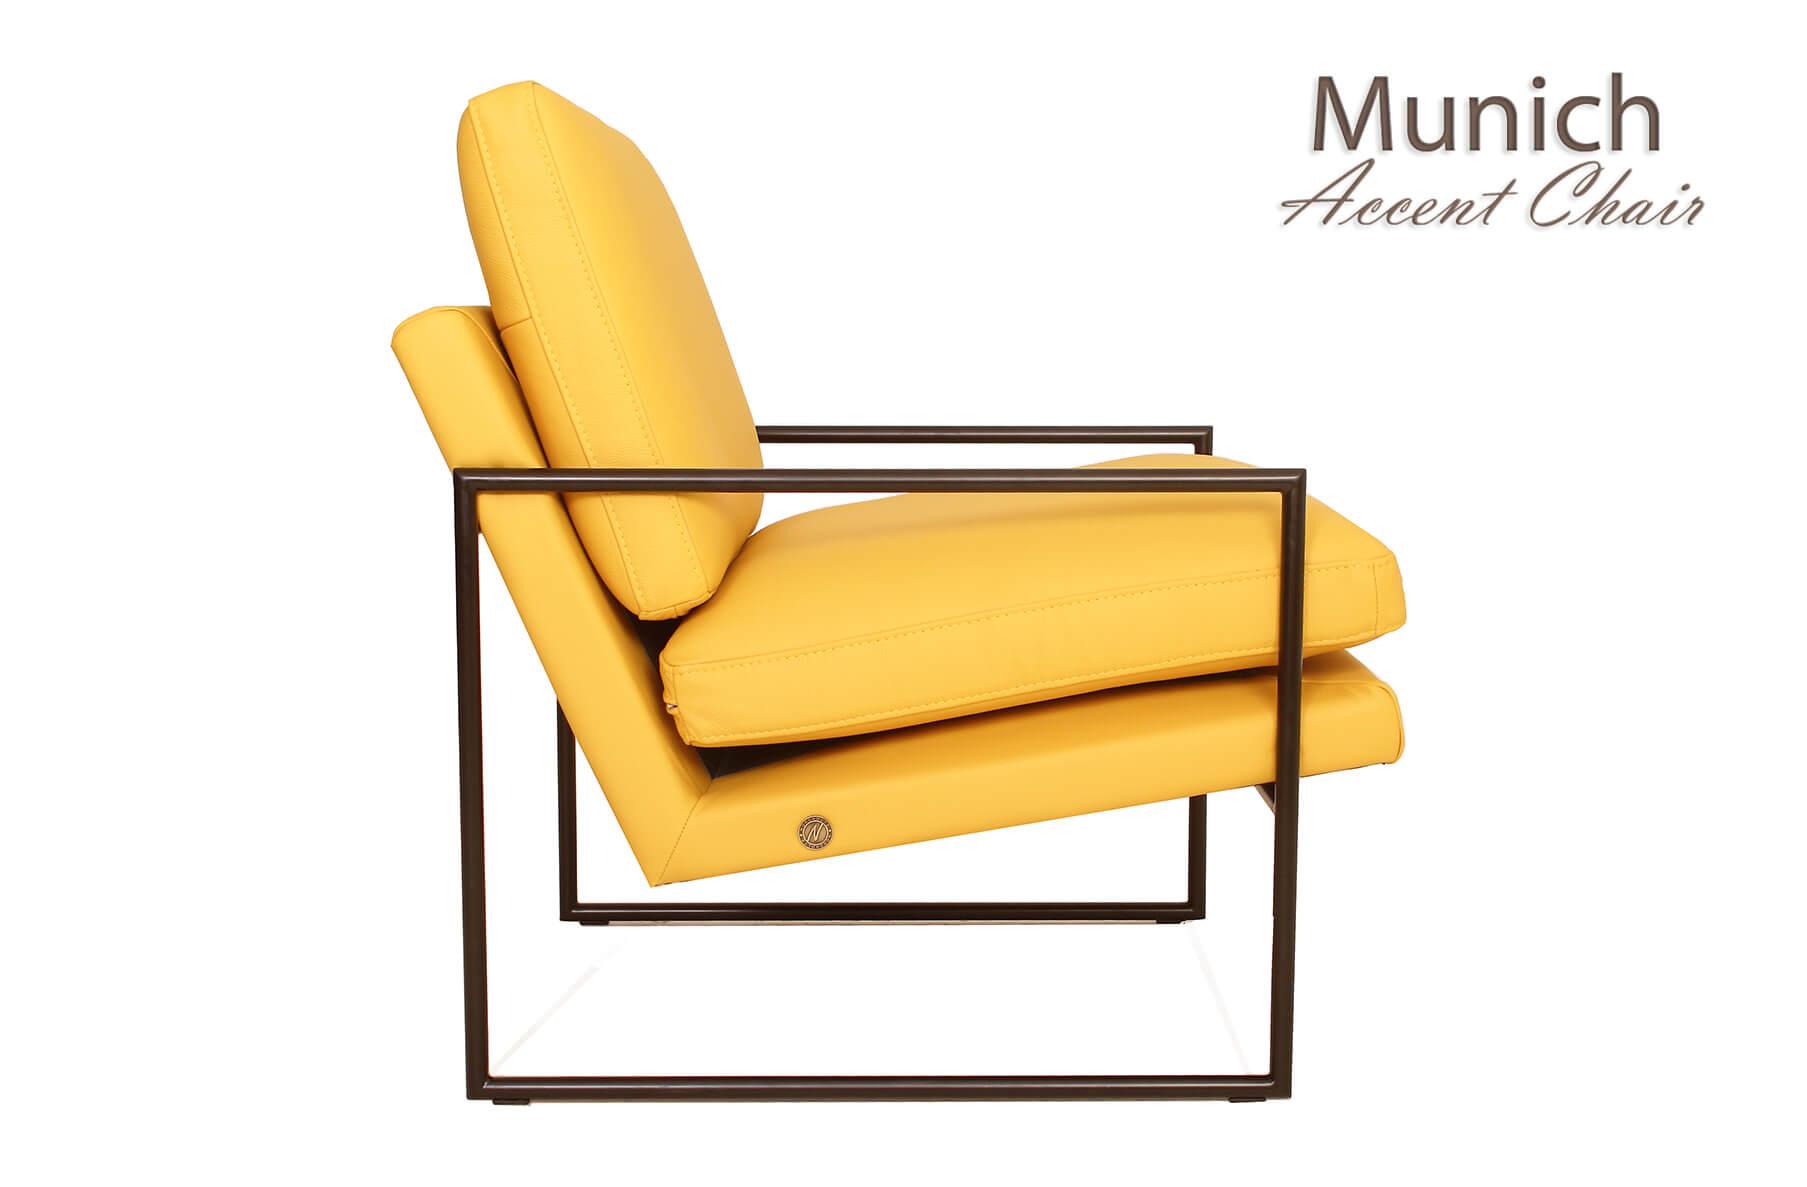 Munich accent chair, Cheap